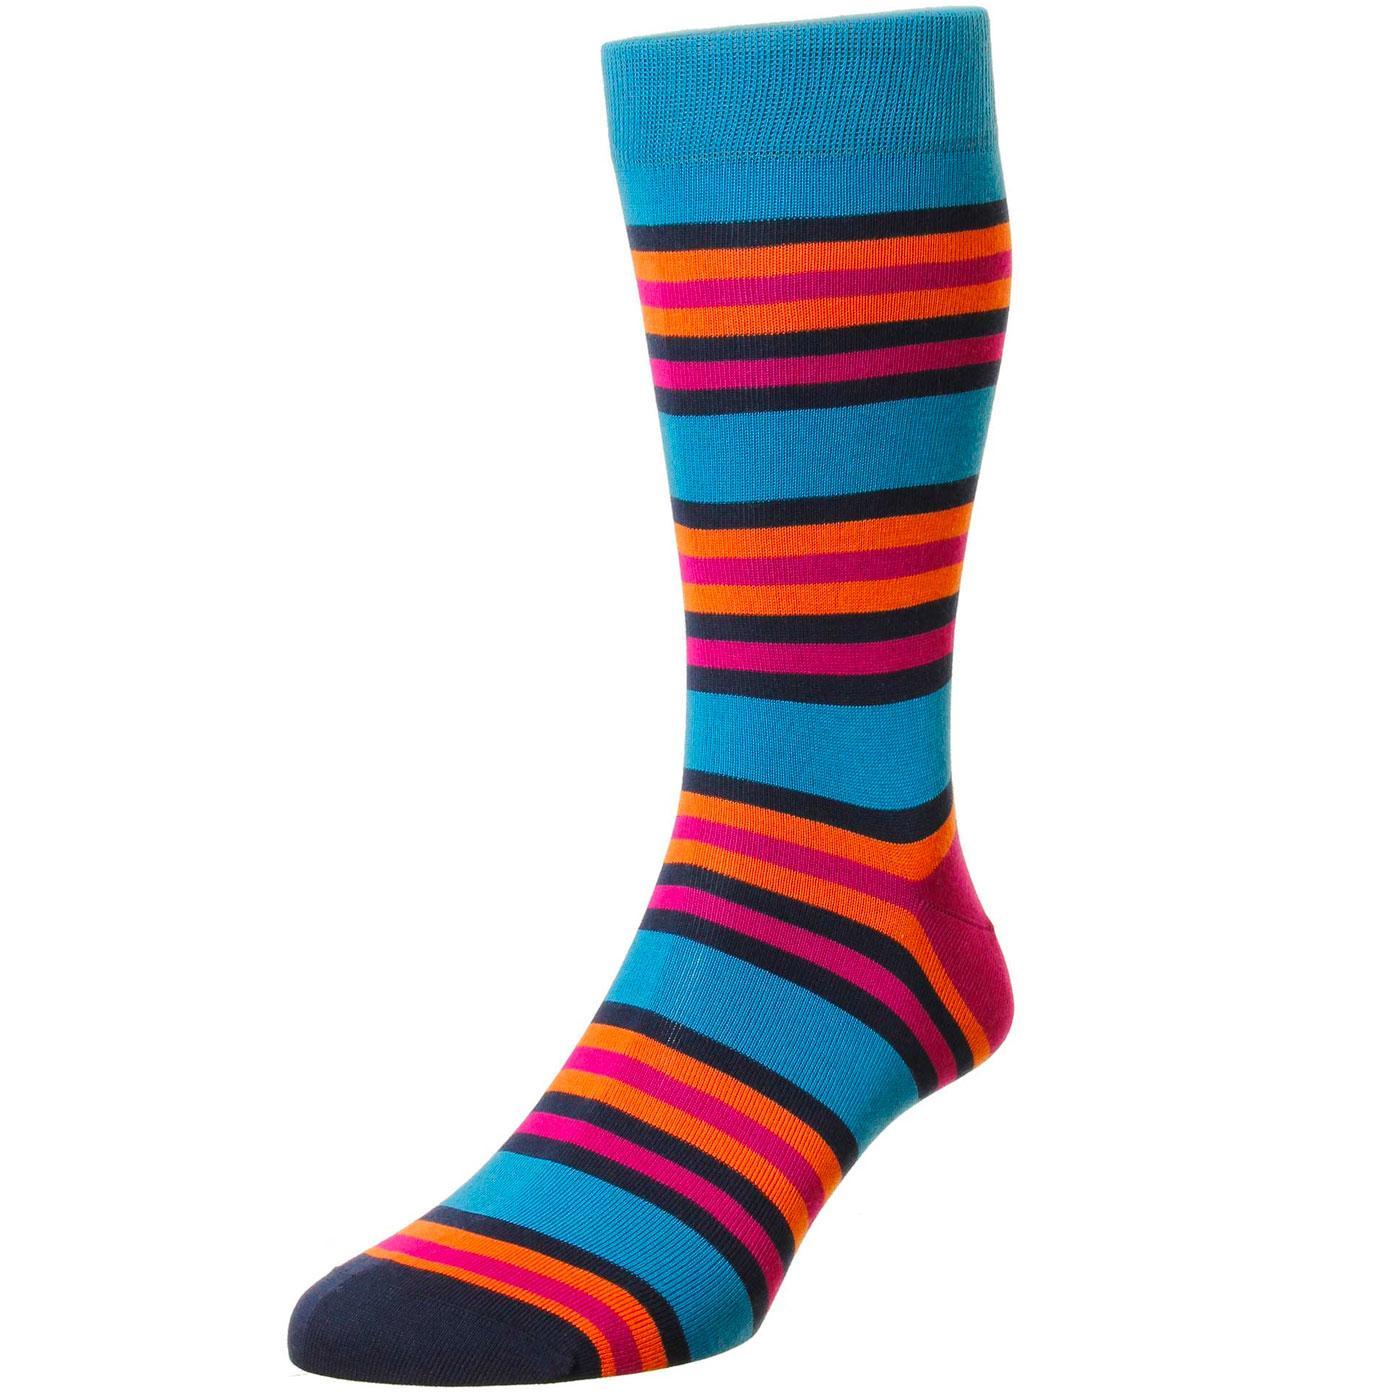 + Shibuya PANTHERELLA Retro Mod Stripe Socks (PB)